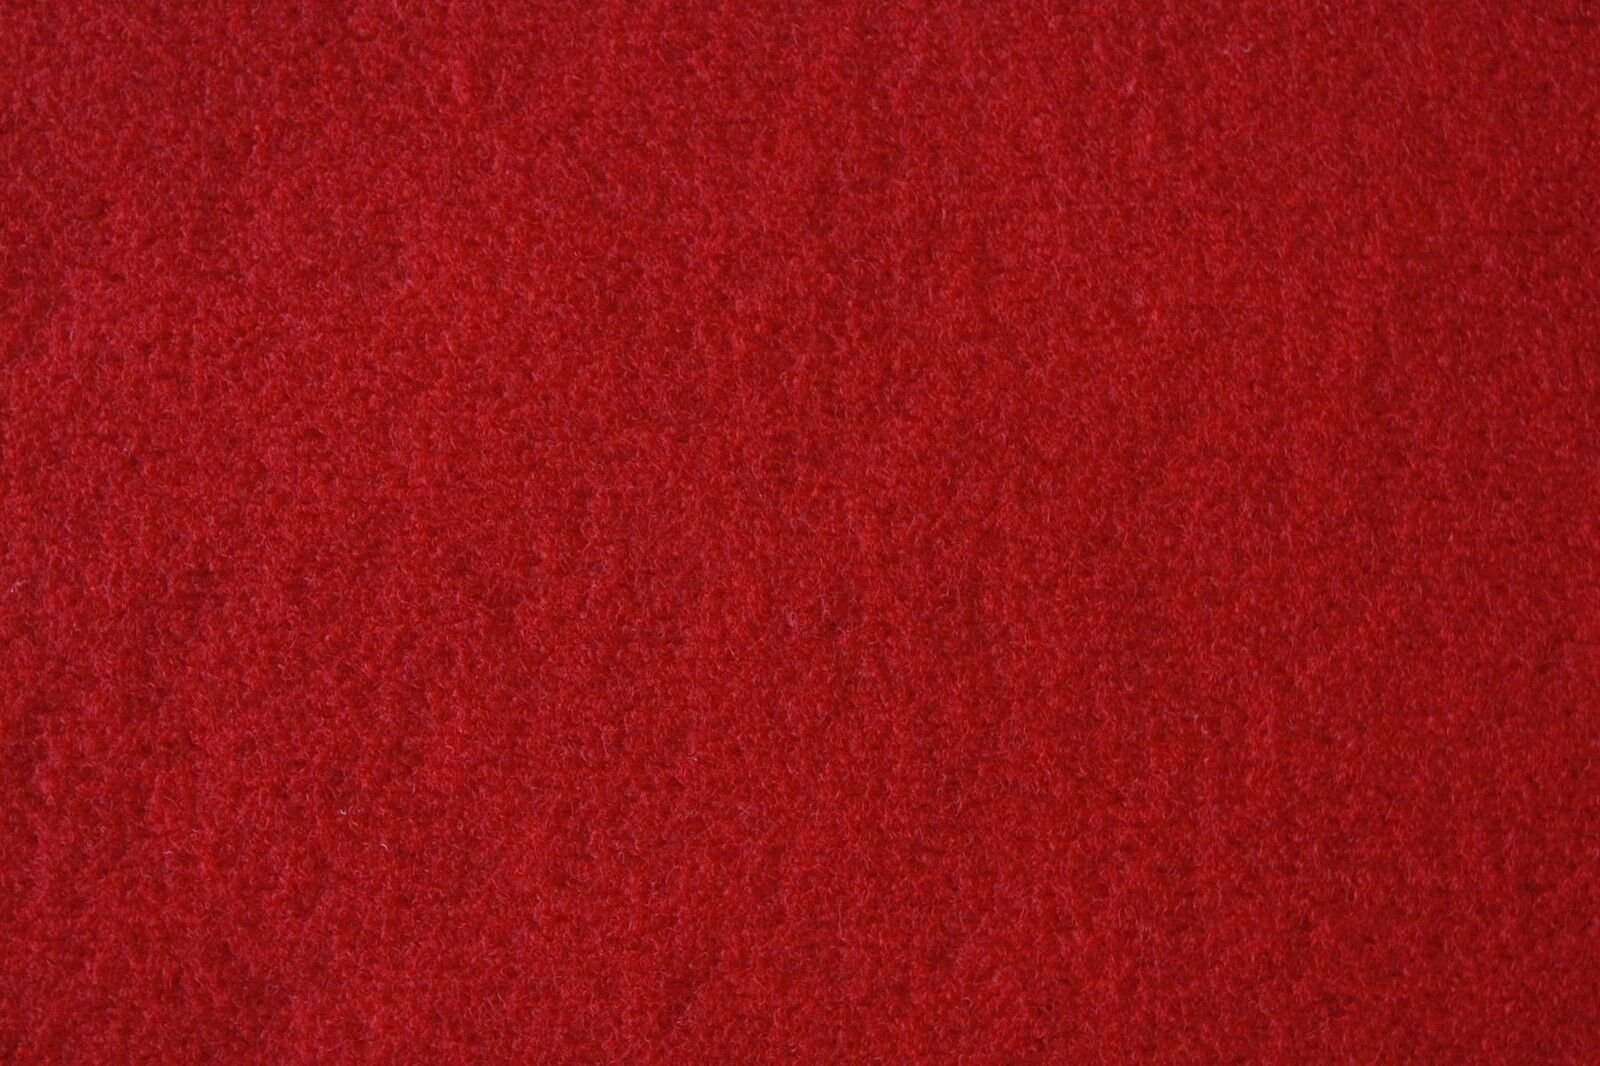 Pelouse Pelouse Pelouse Tapis Art Pelouse Standard + rouge 200x500 cm 96f037